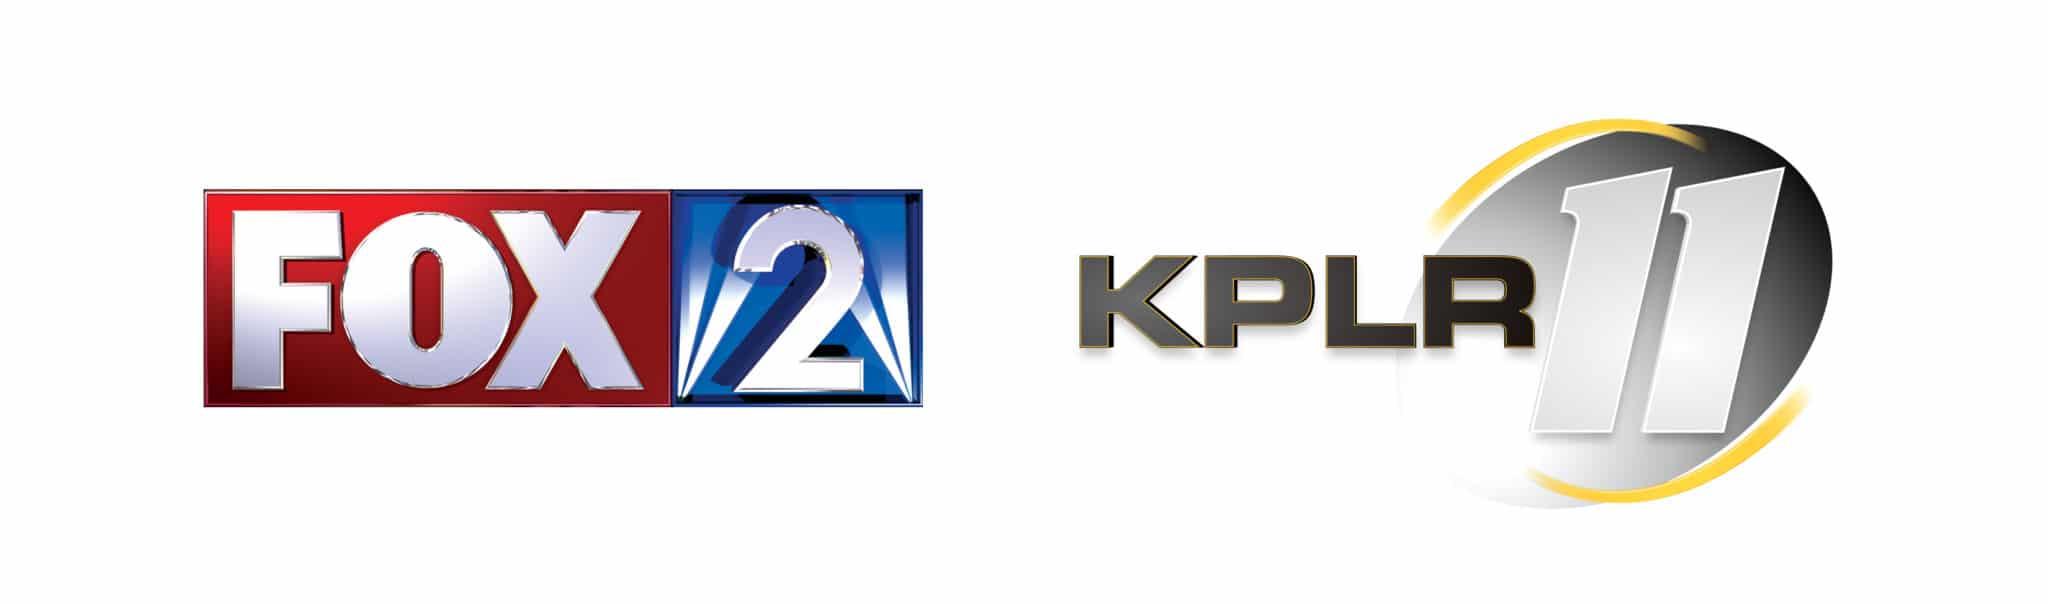 FOX 2 KPLR 11 TV COLOR logo